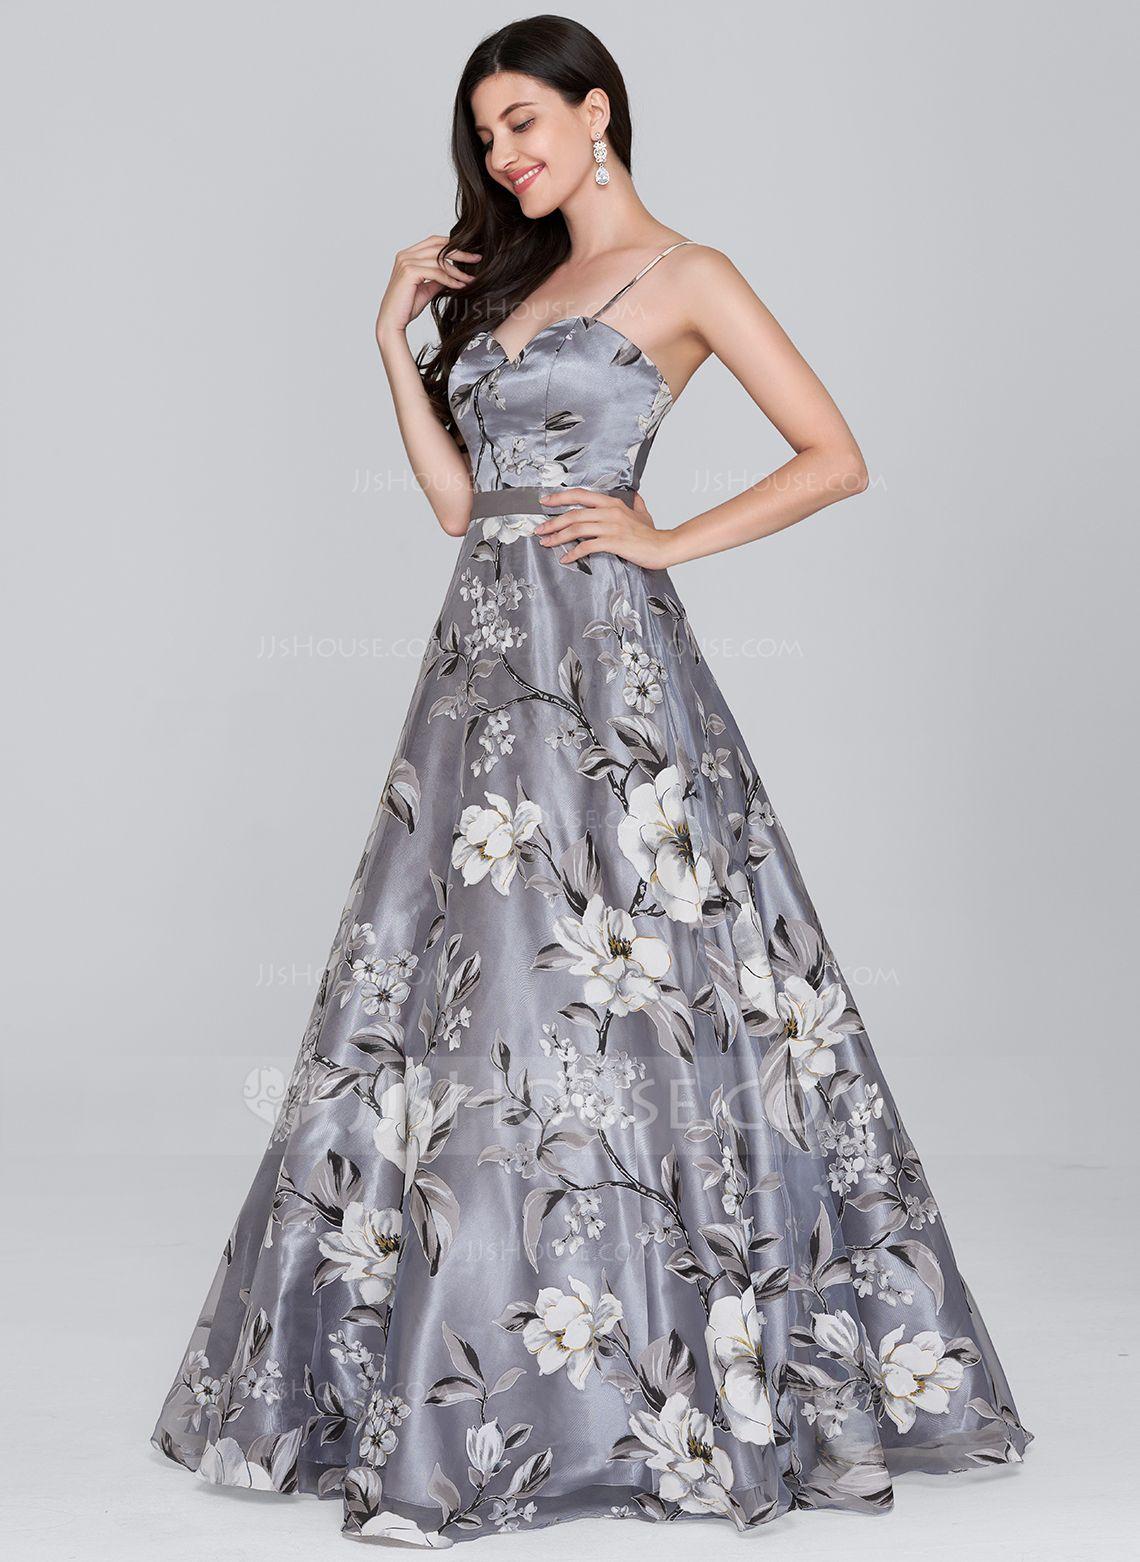 Alineprincess sweetheart floorlength organza prom dress